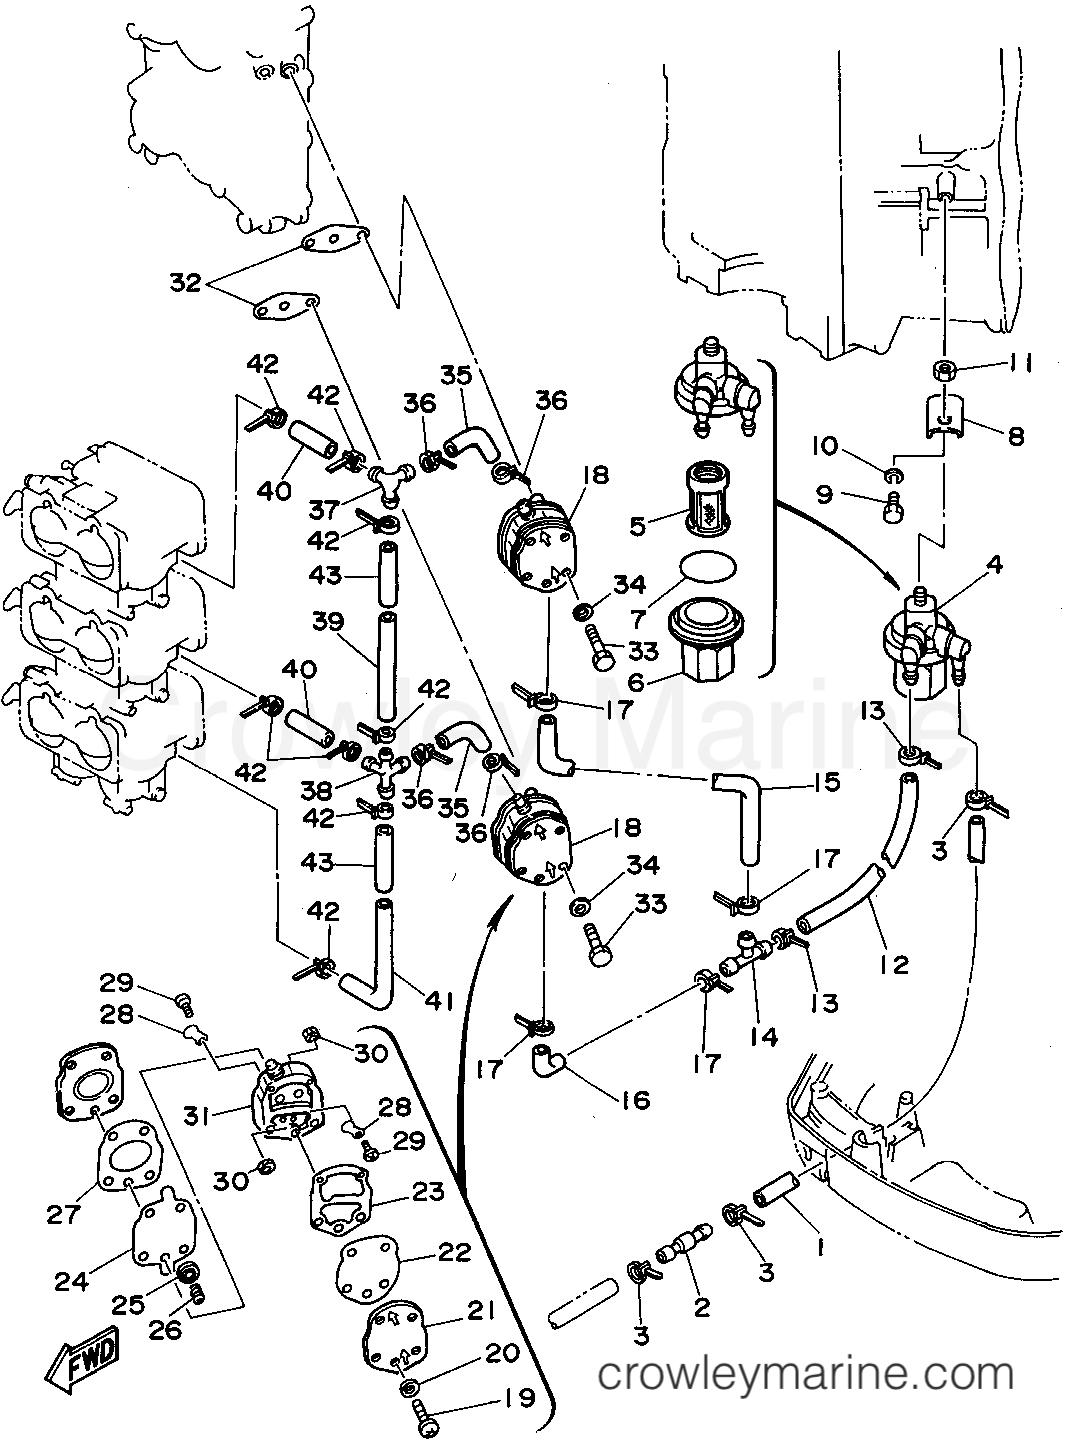 Evinrude 60 Hp Electric Diagram Diagram Wiring Diagram